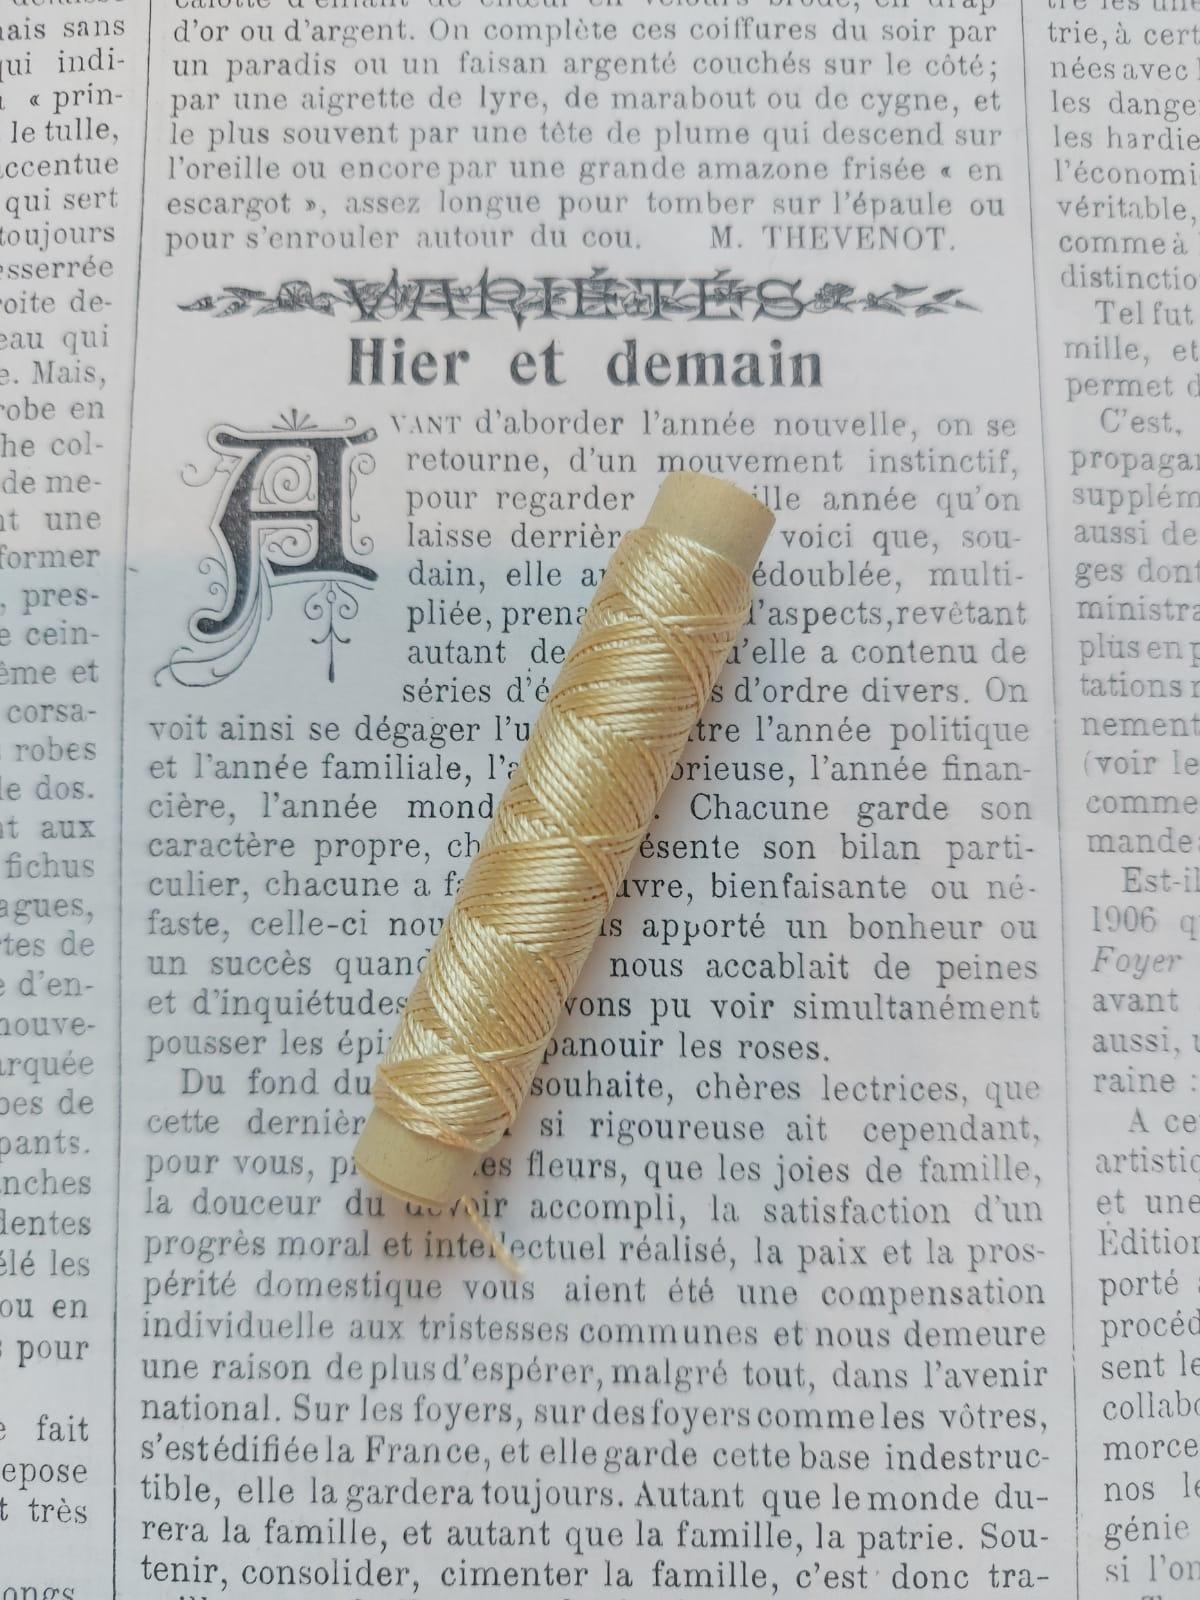 Silk Buttonhole Thread (white, cream, yellow, brown, green, gold)